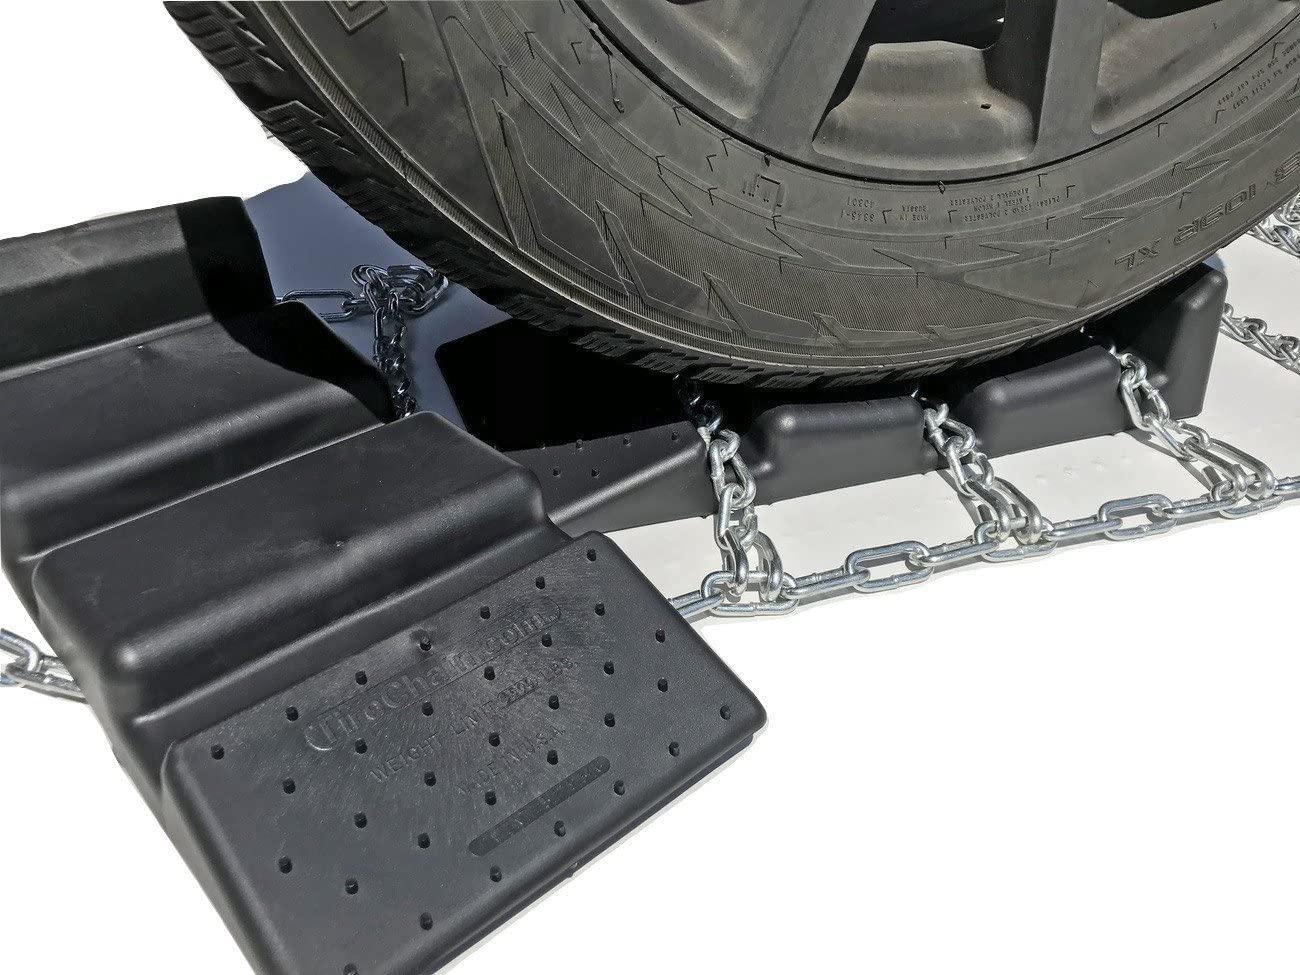 TireChain.com Tire Chains Ramps - SNO-Chain Ramps.